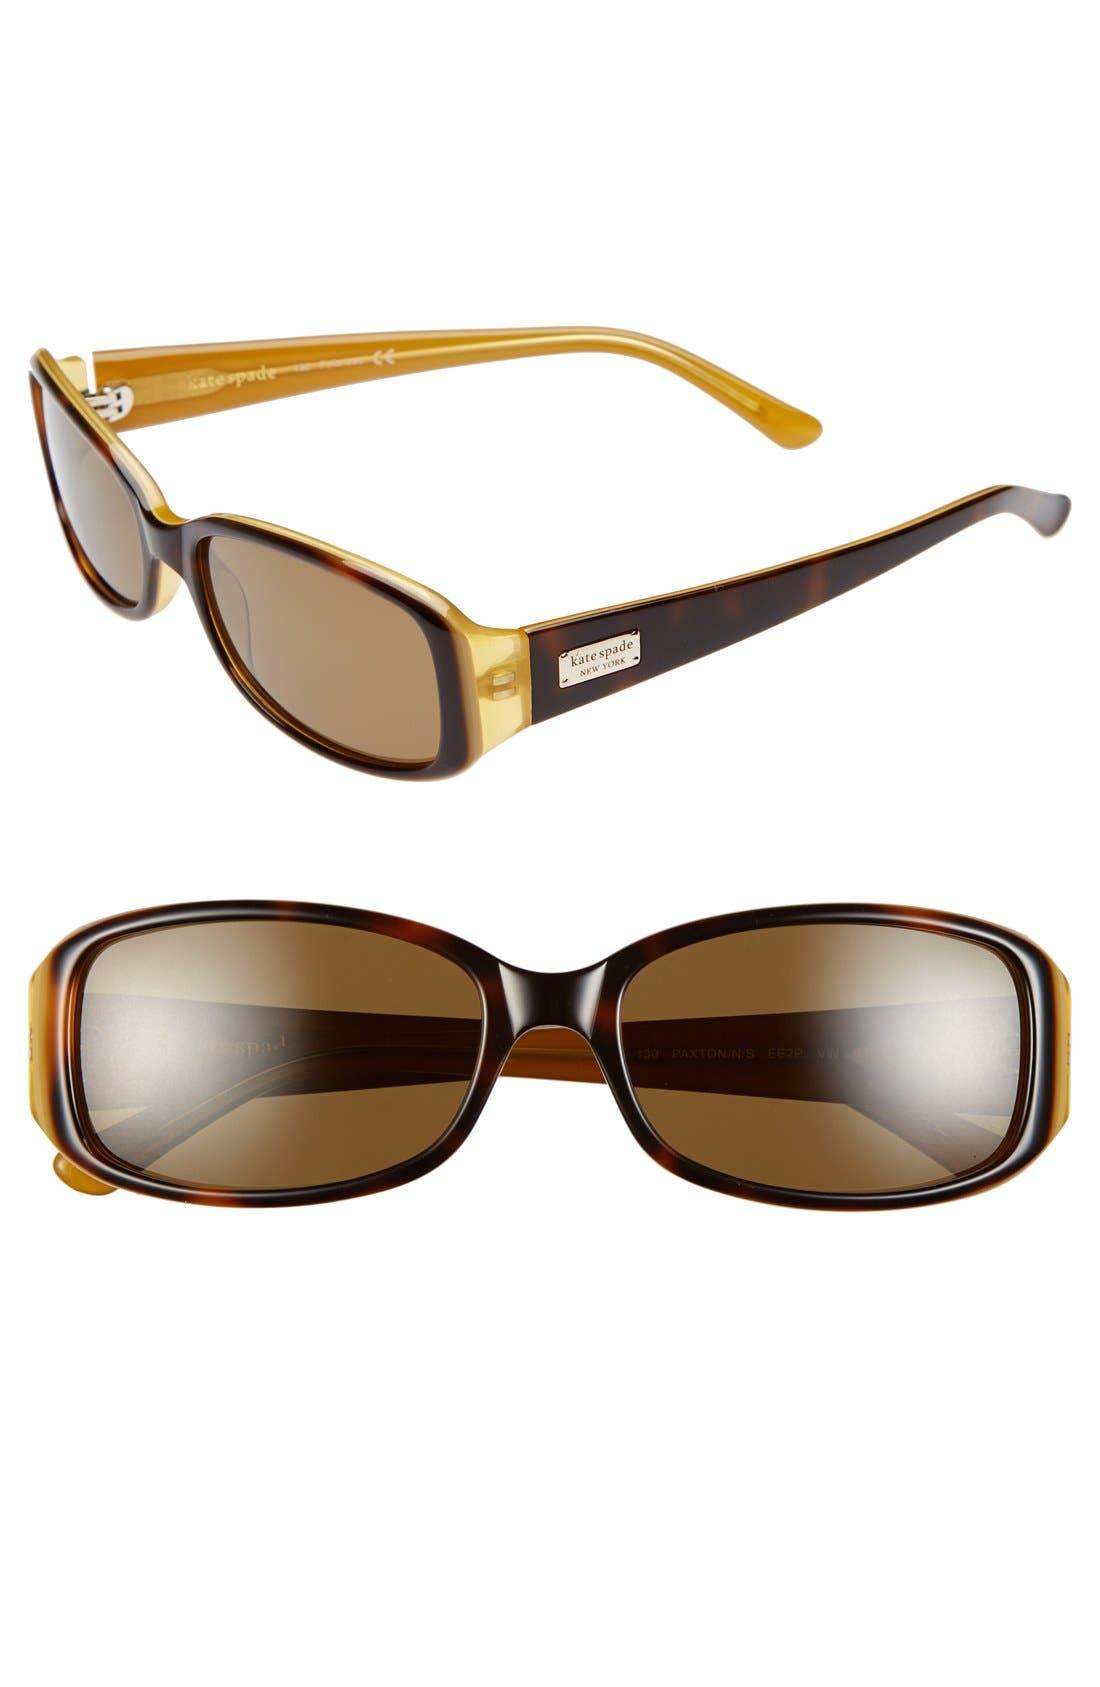 Main Image - kate spade new york 'paxton' 53mm polarized sunglasses